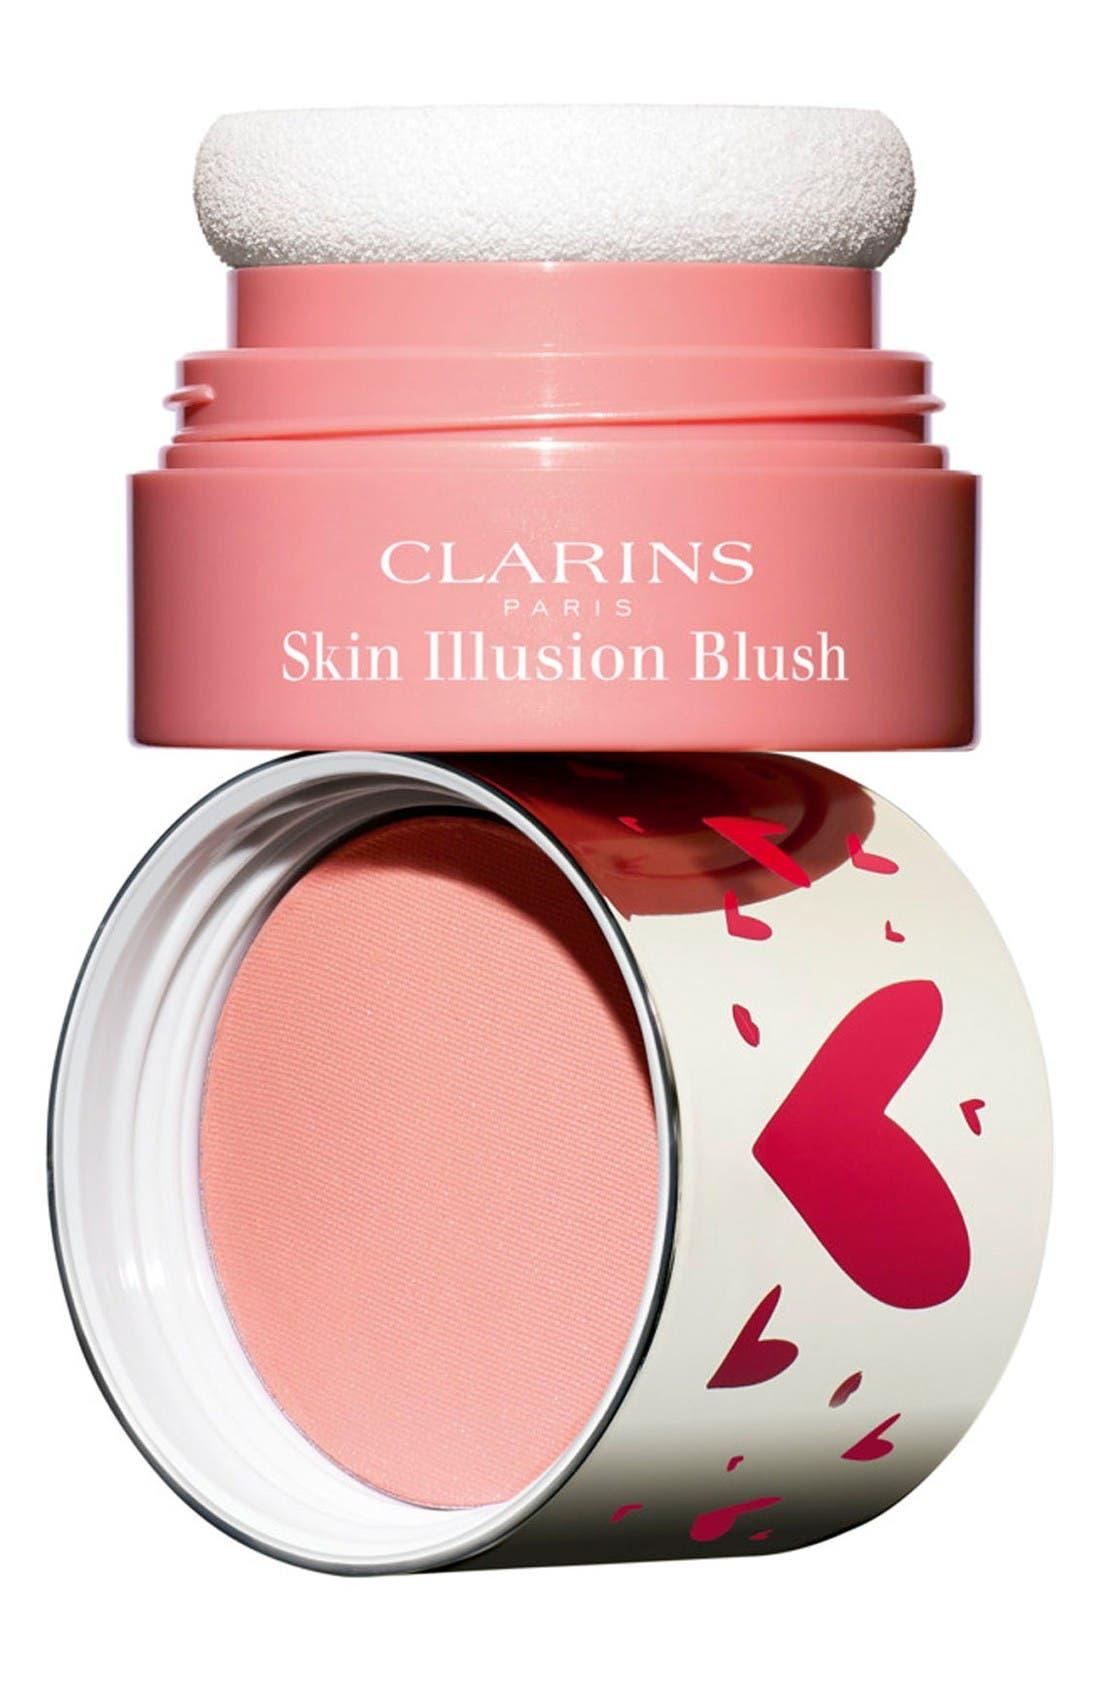 Main Image - Clarins Skin Illusion Blush (Limited Edition)